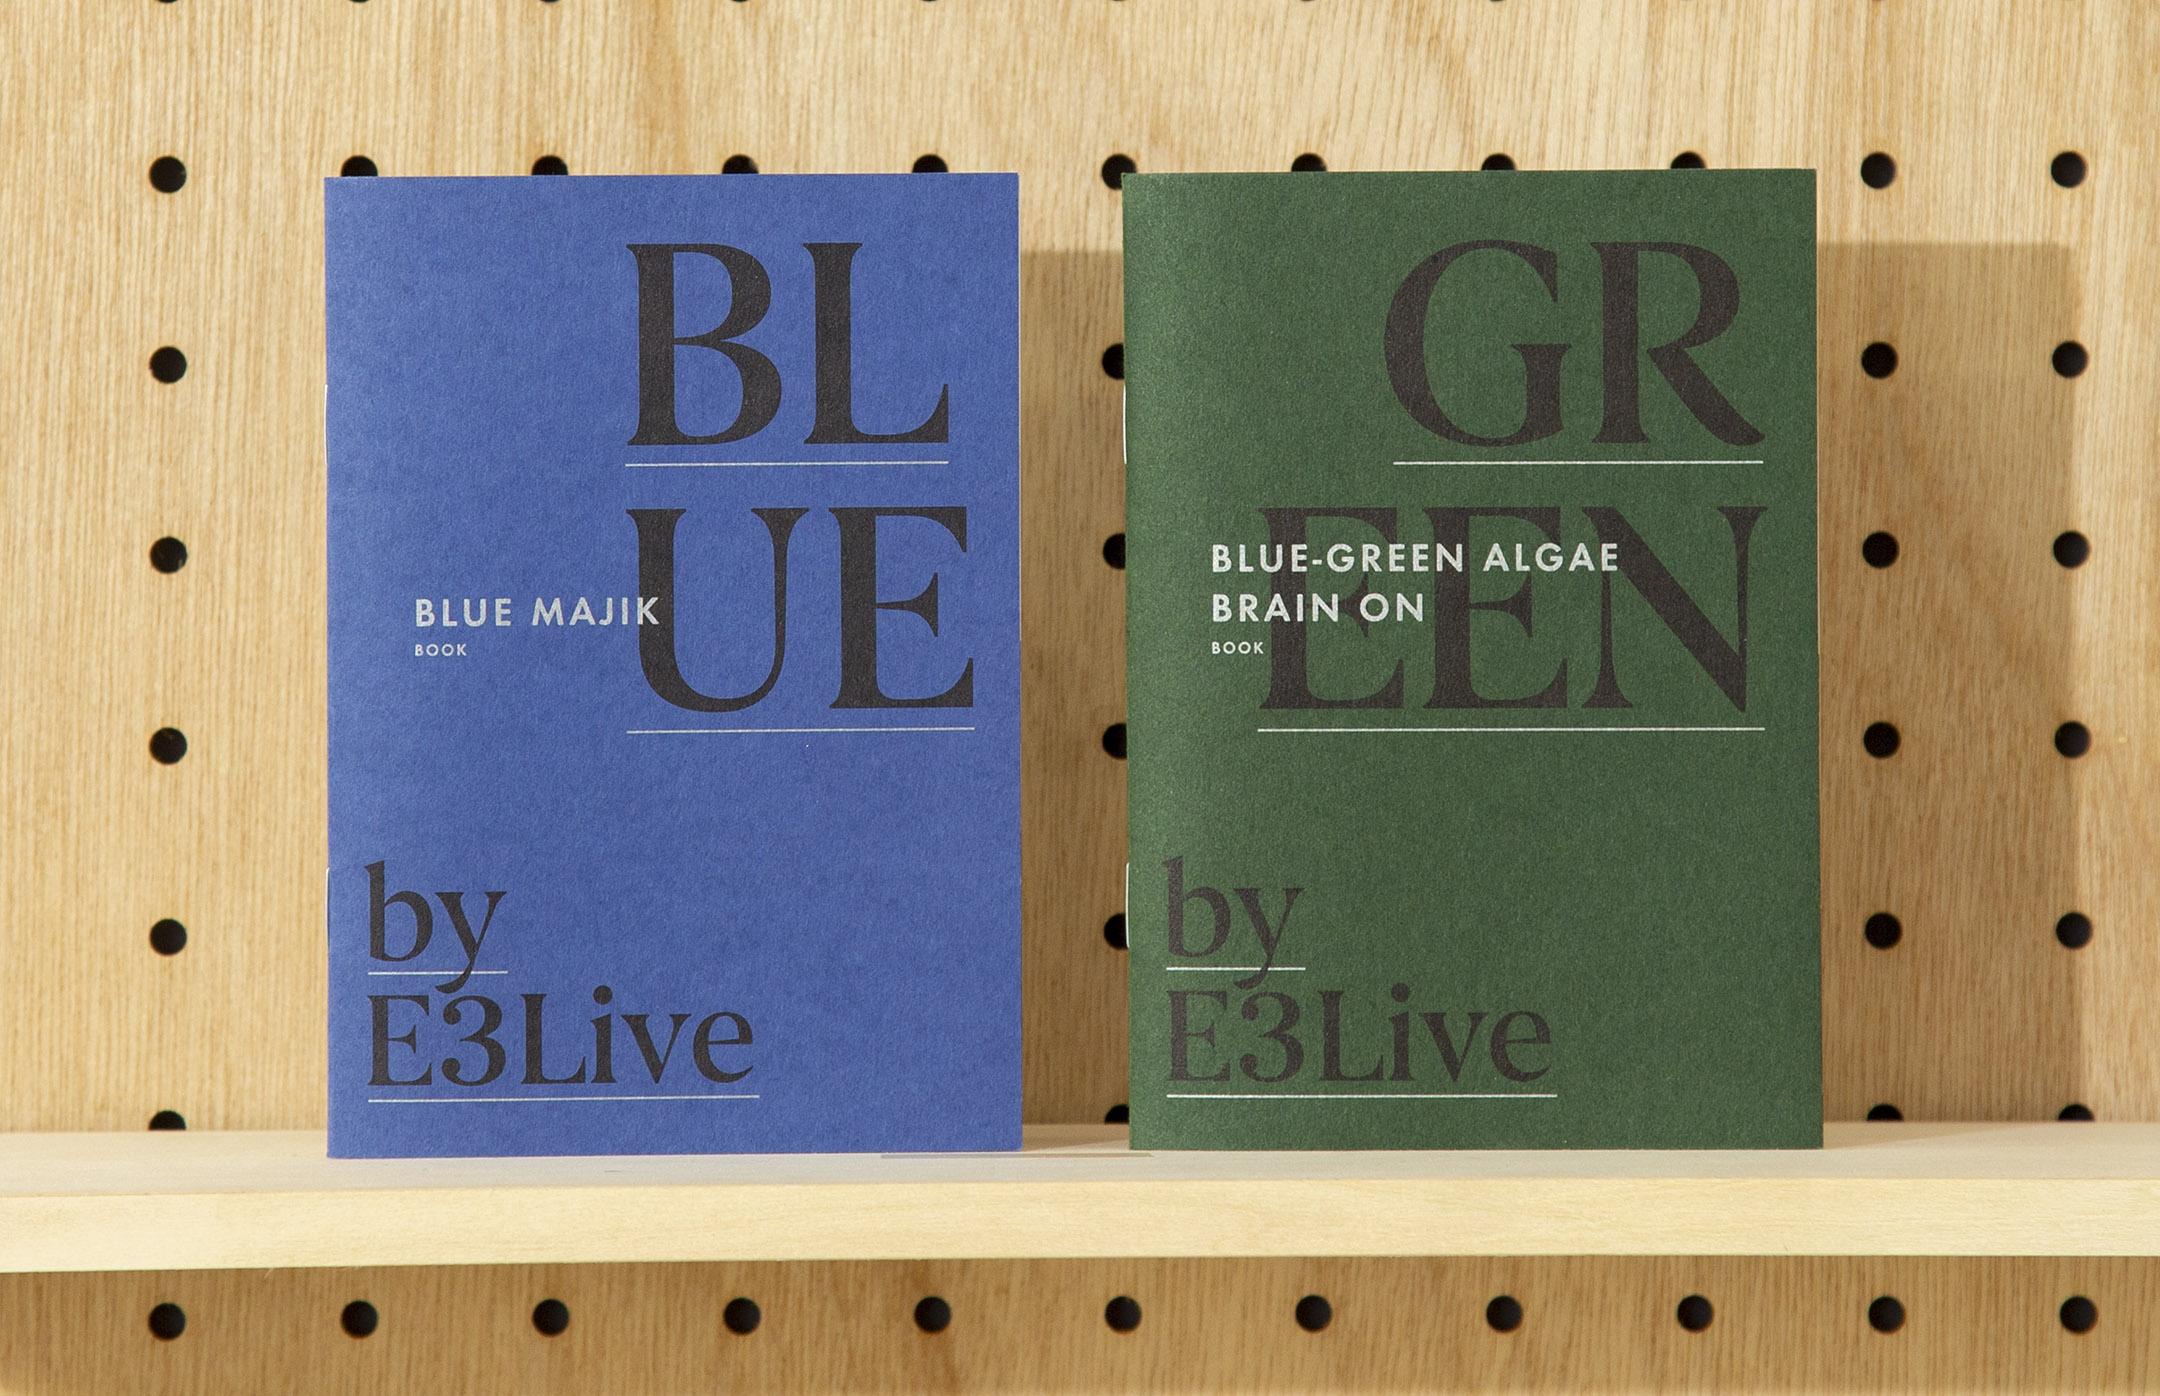 BLUE MAJIK by E3Live